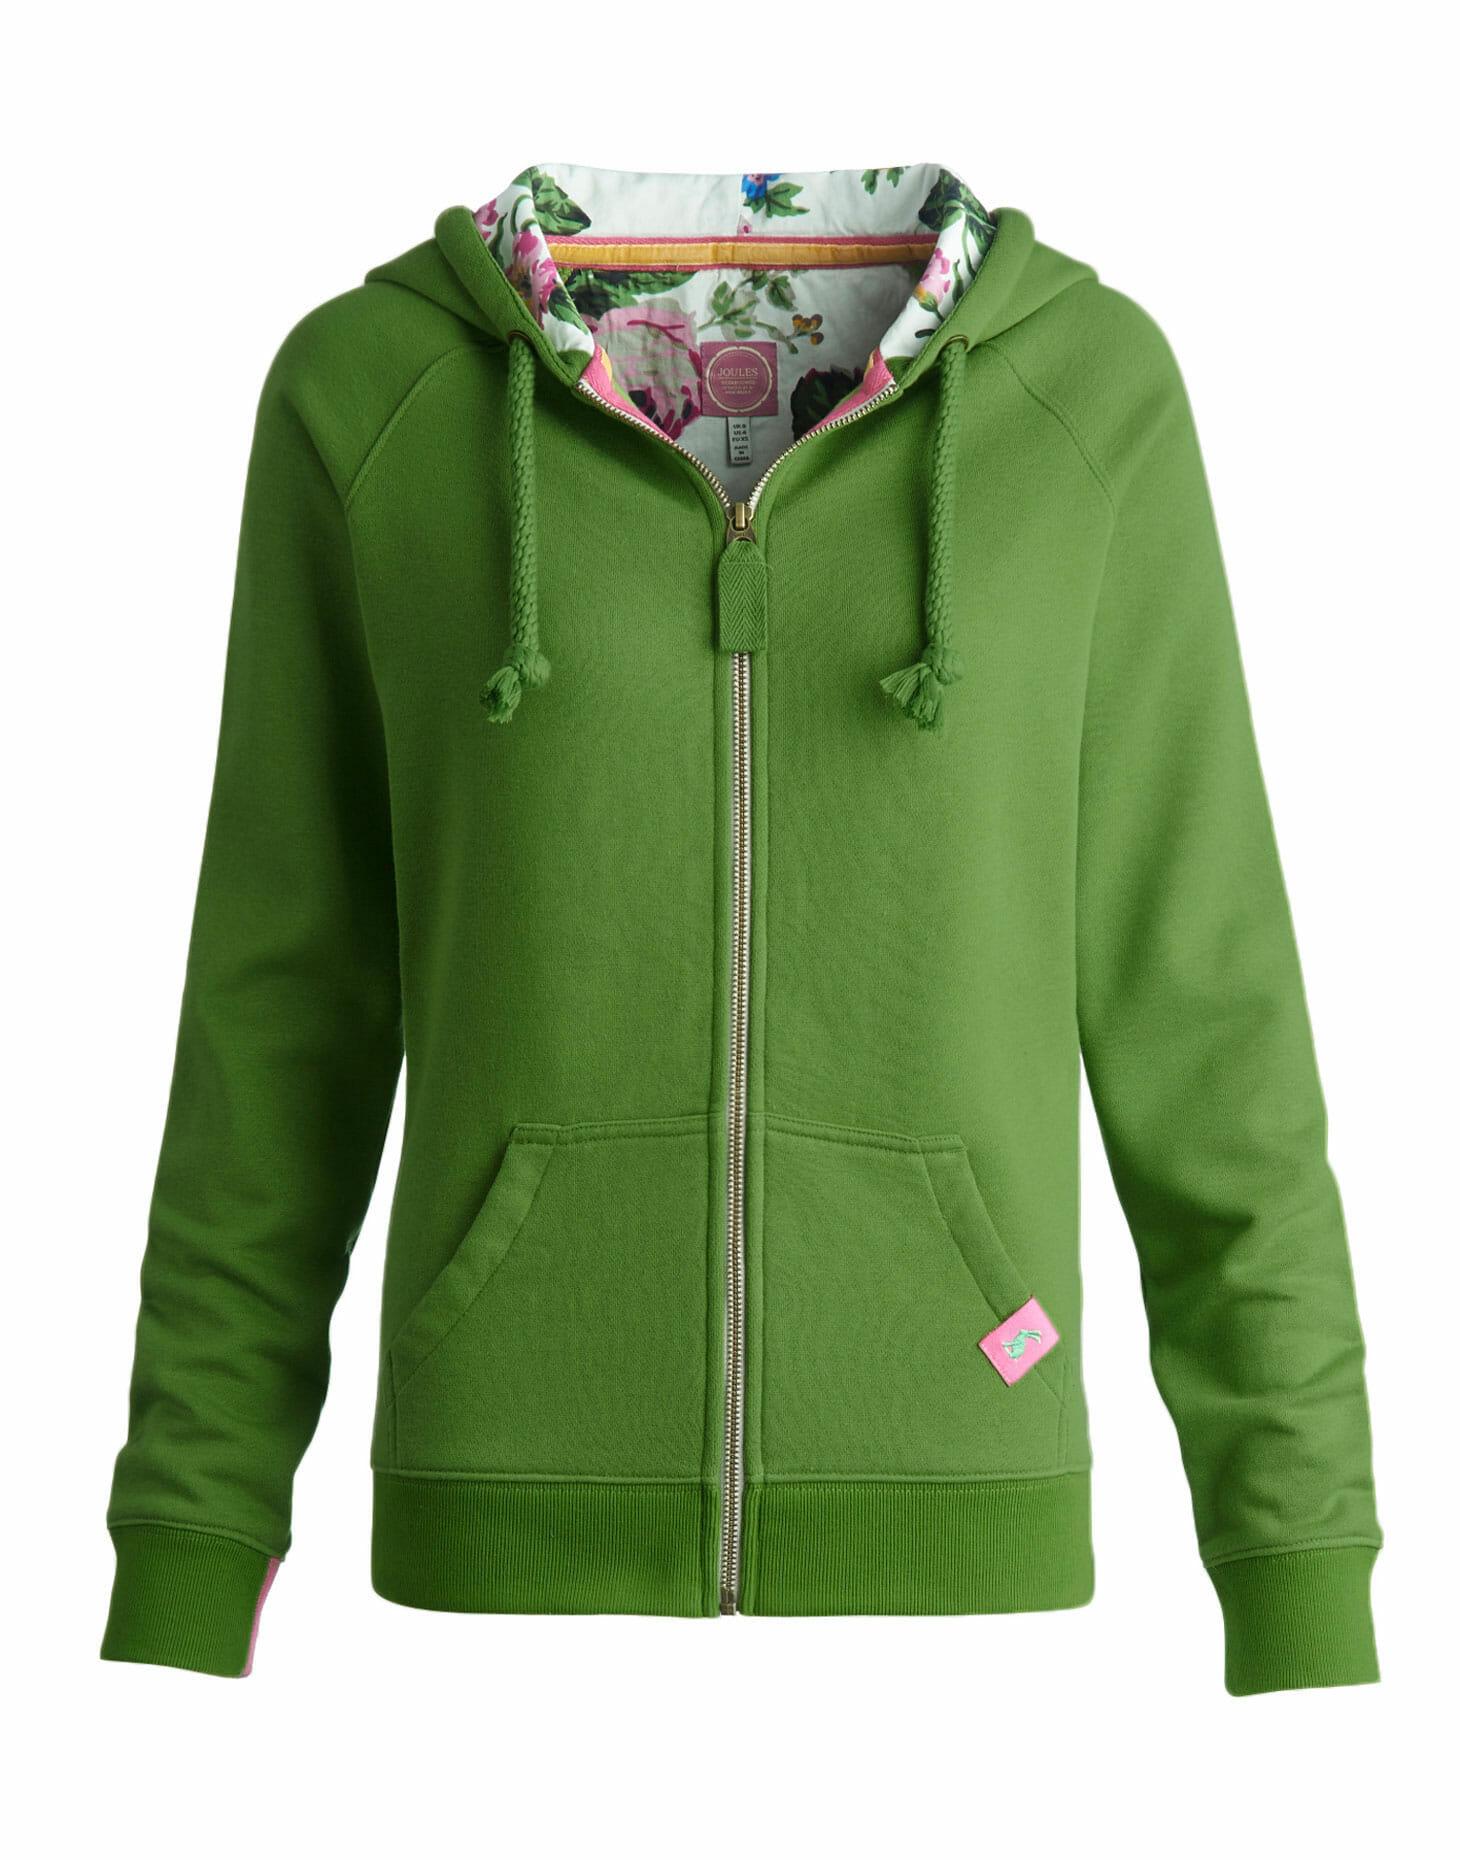 Wholesale sweatshirts hoodies